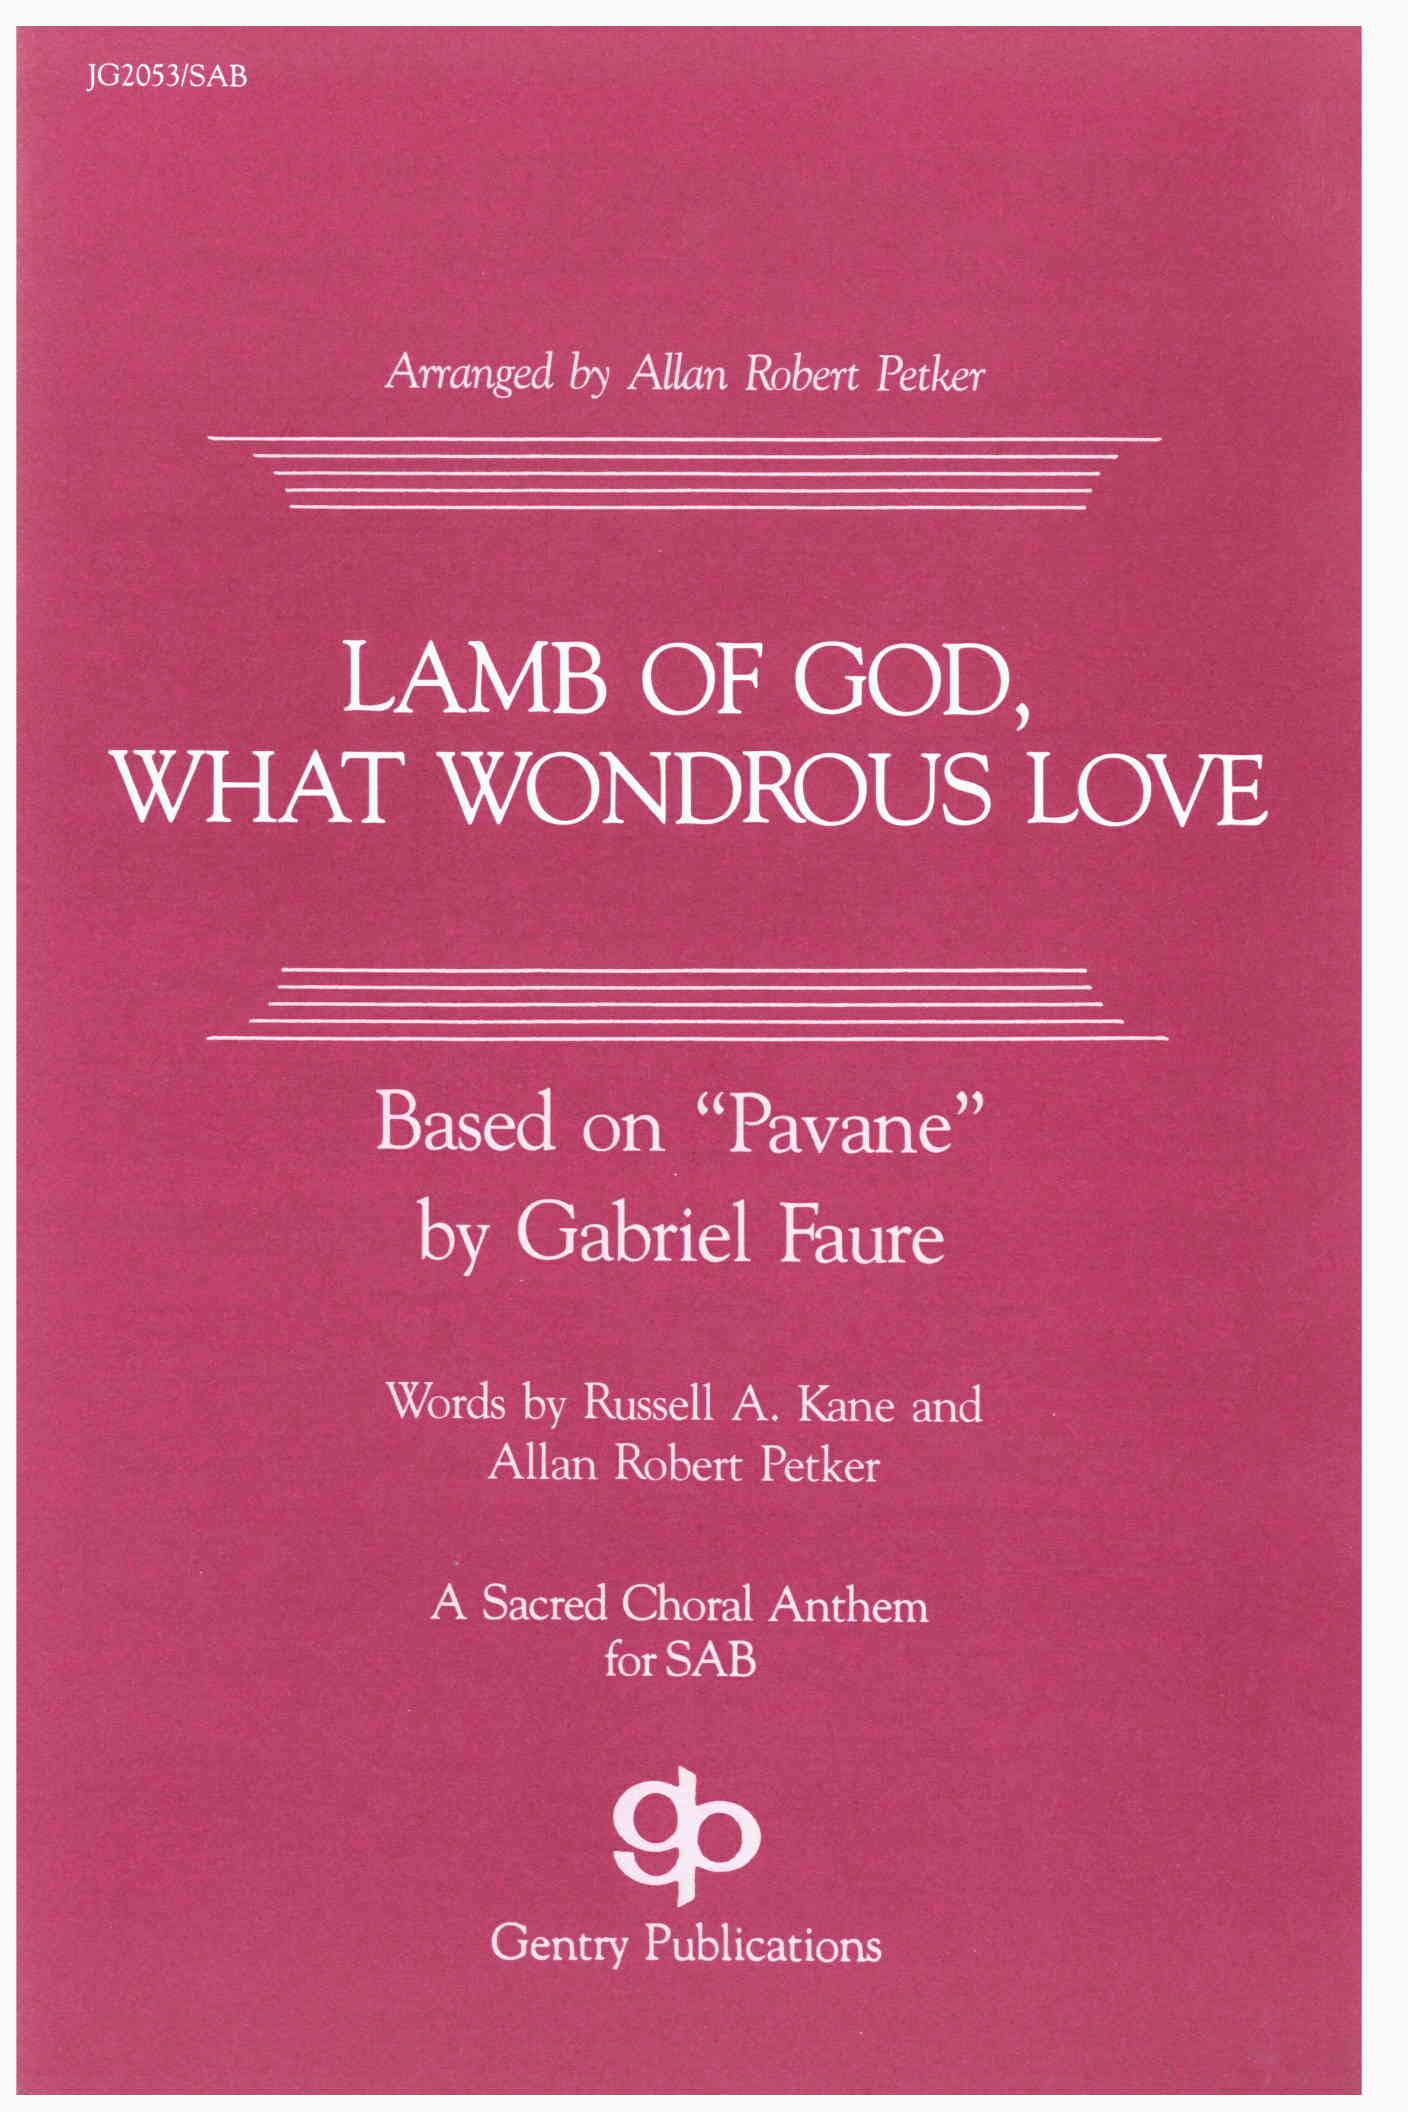 Lamb Of God, What Wondrous Love